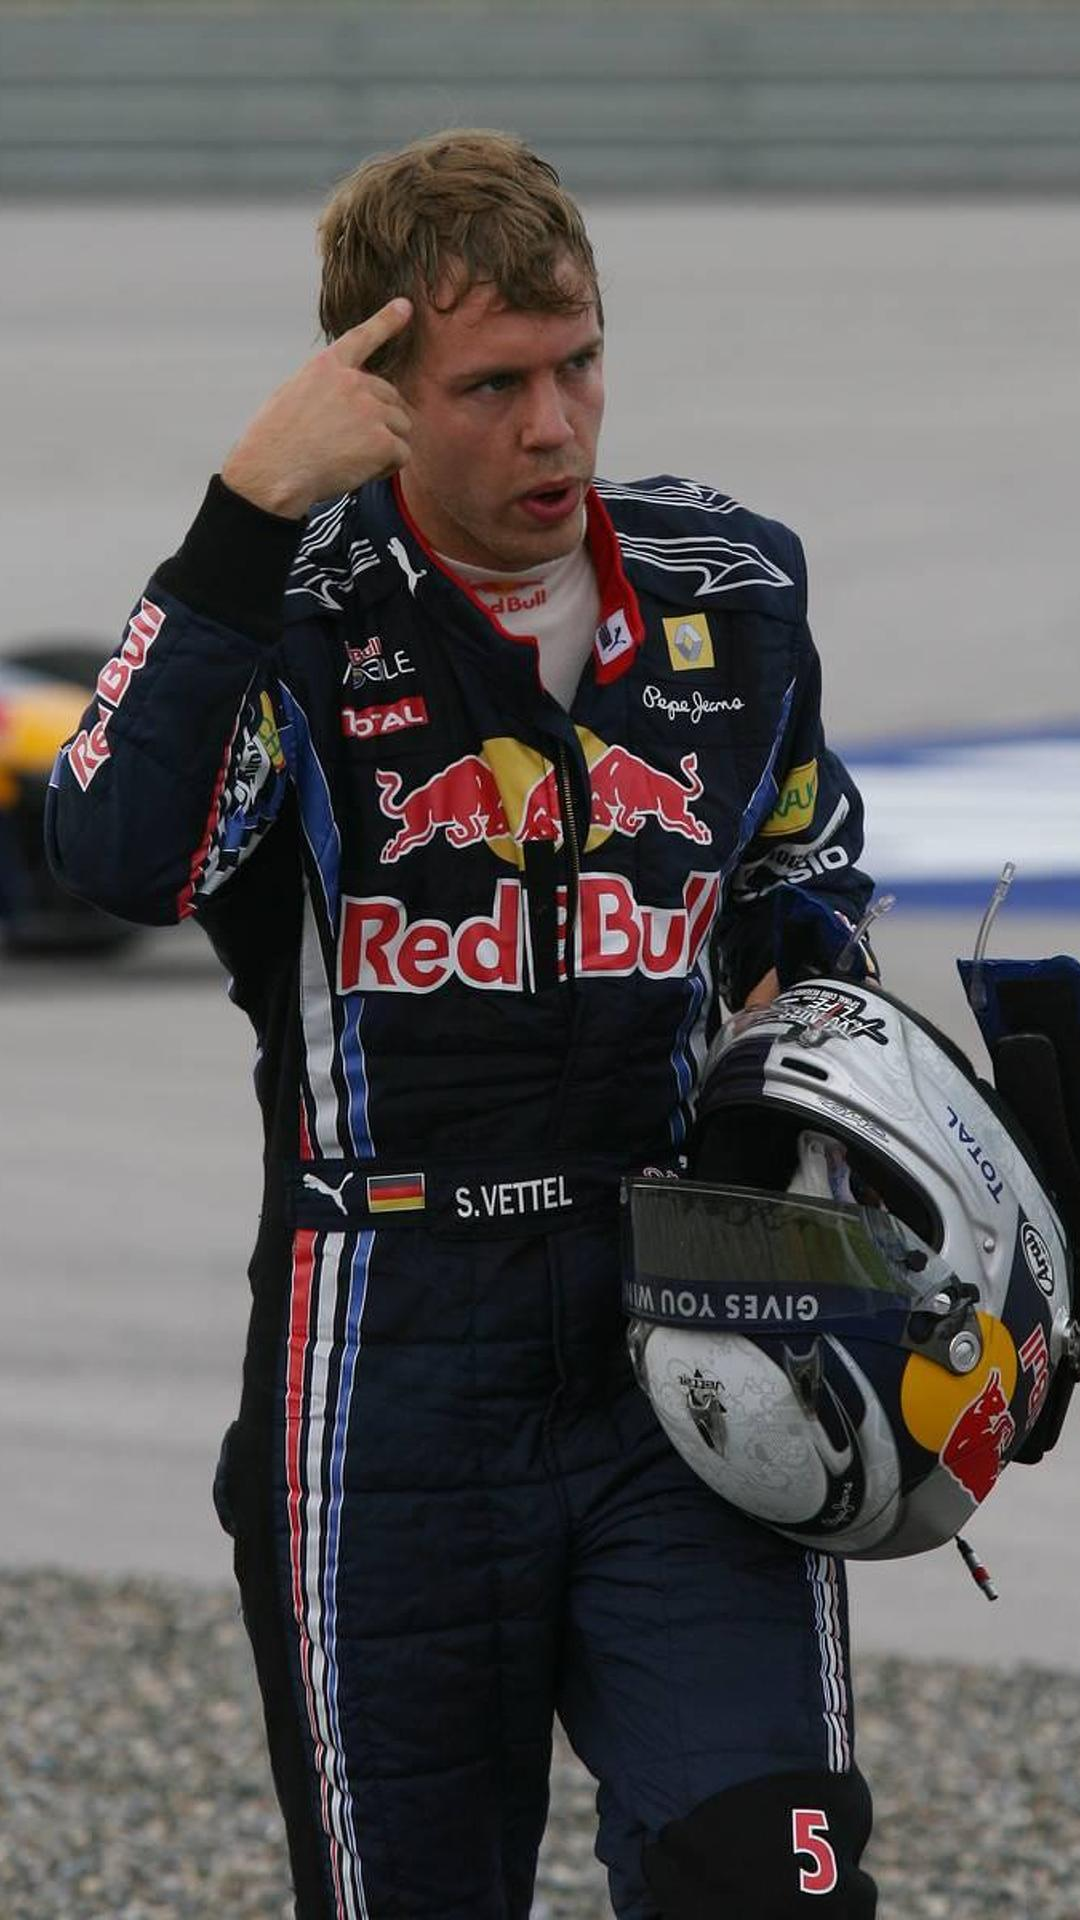 Inexperienced Vettel learning from mistakes - Horner